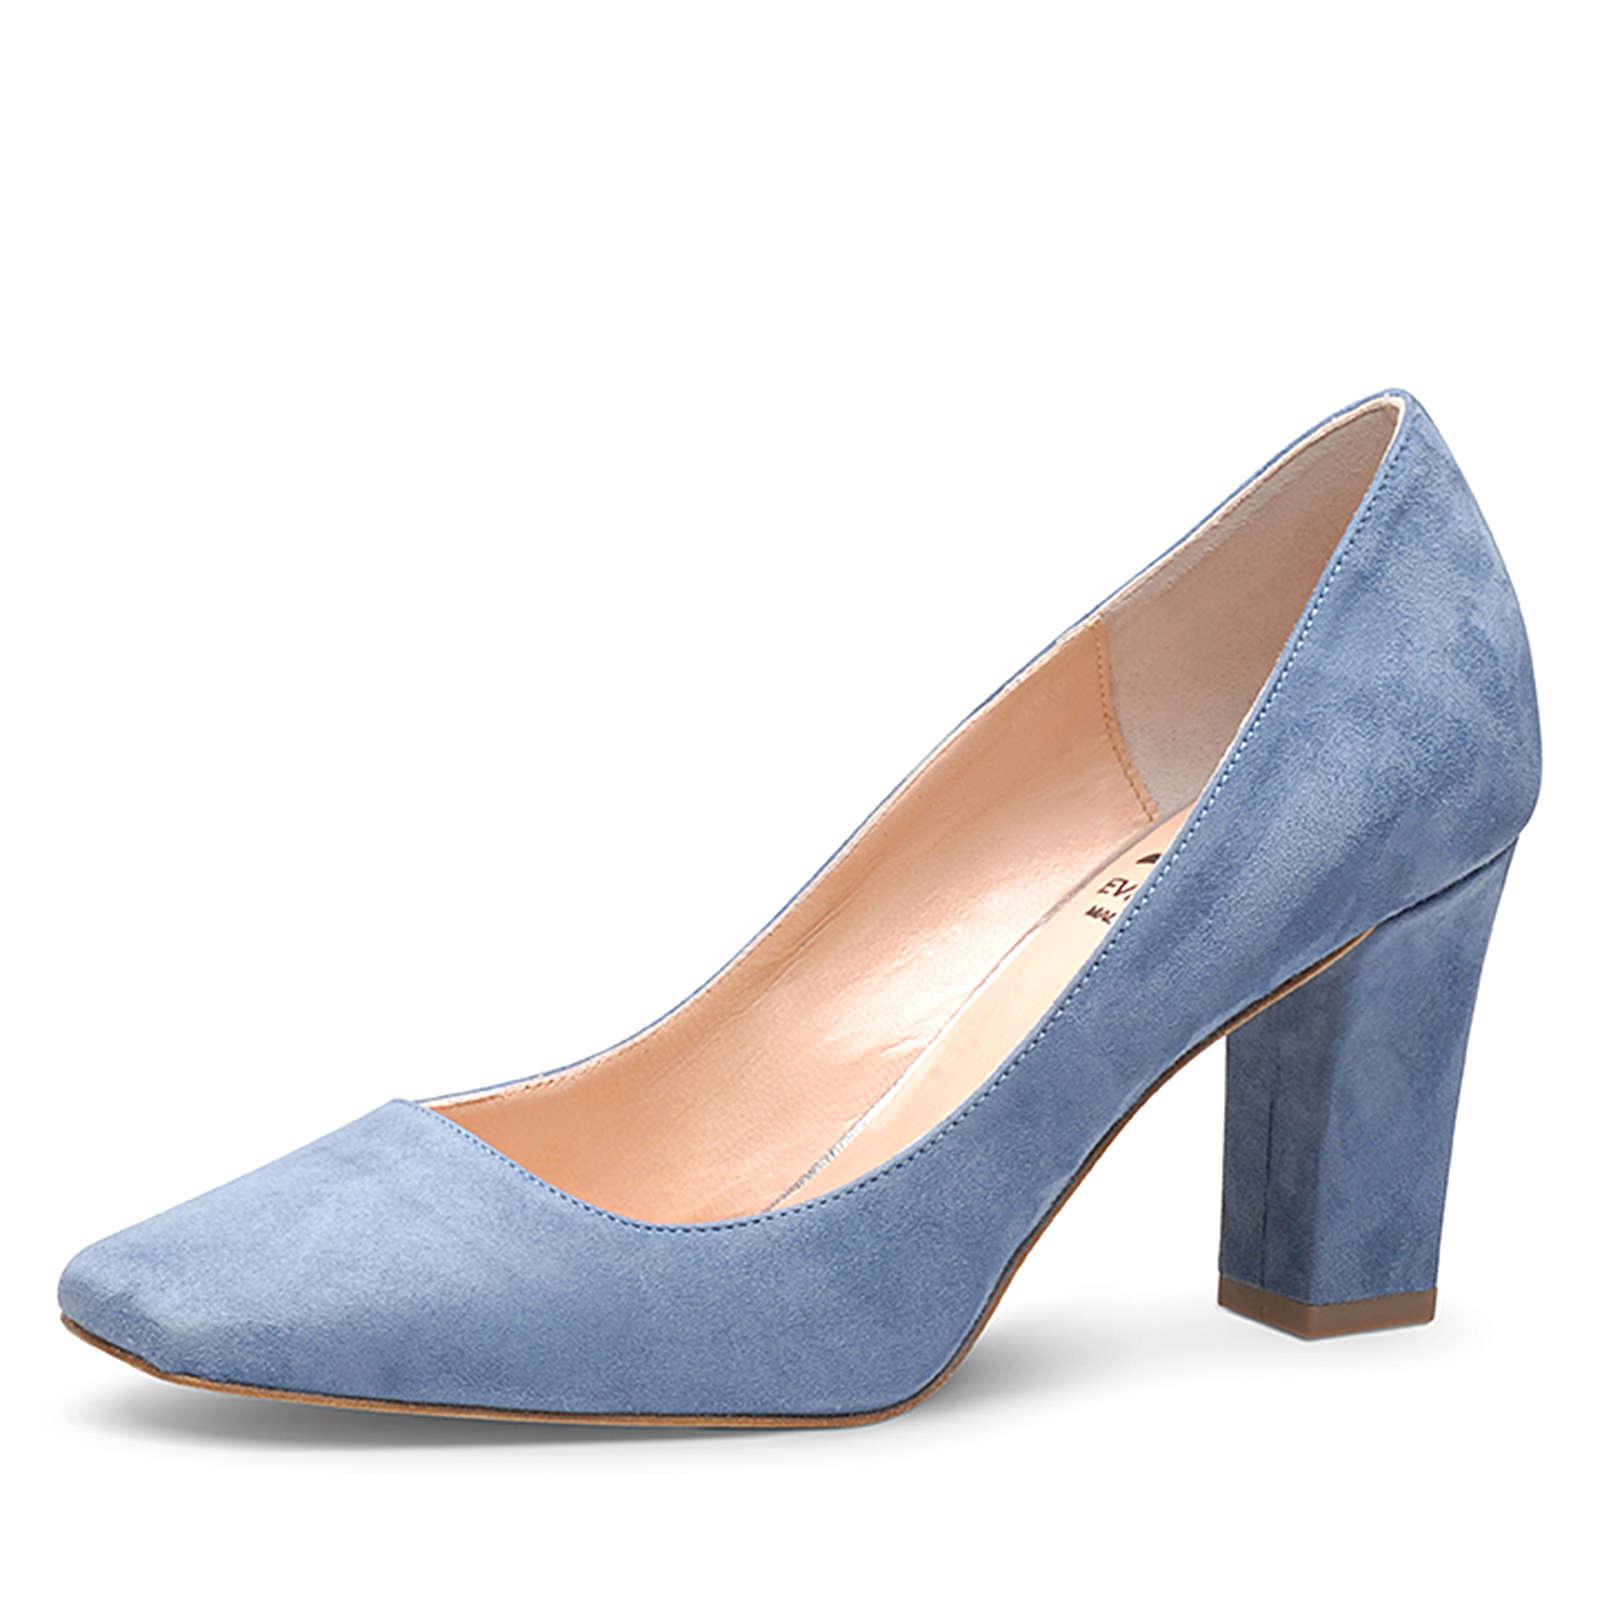 Evita Shoes Pumps blau Damen Gr. 39